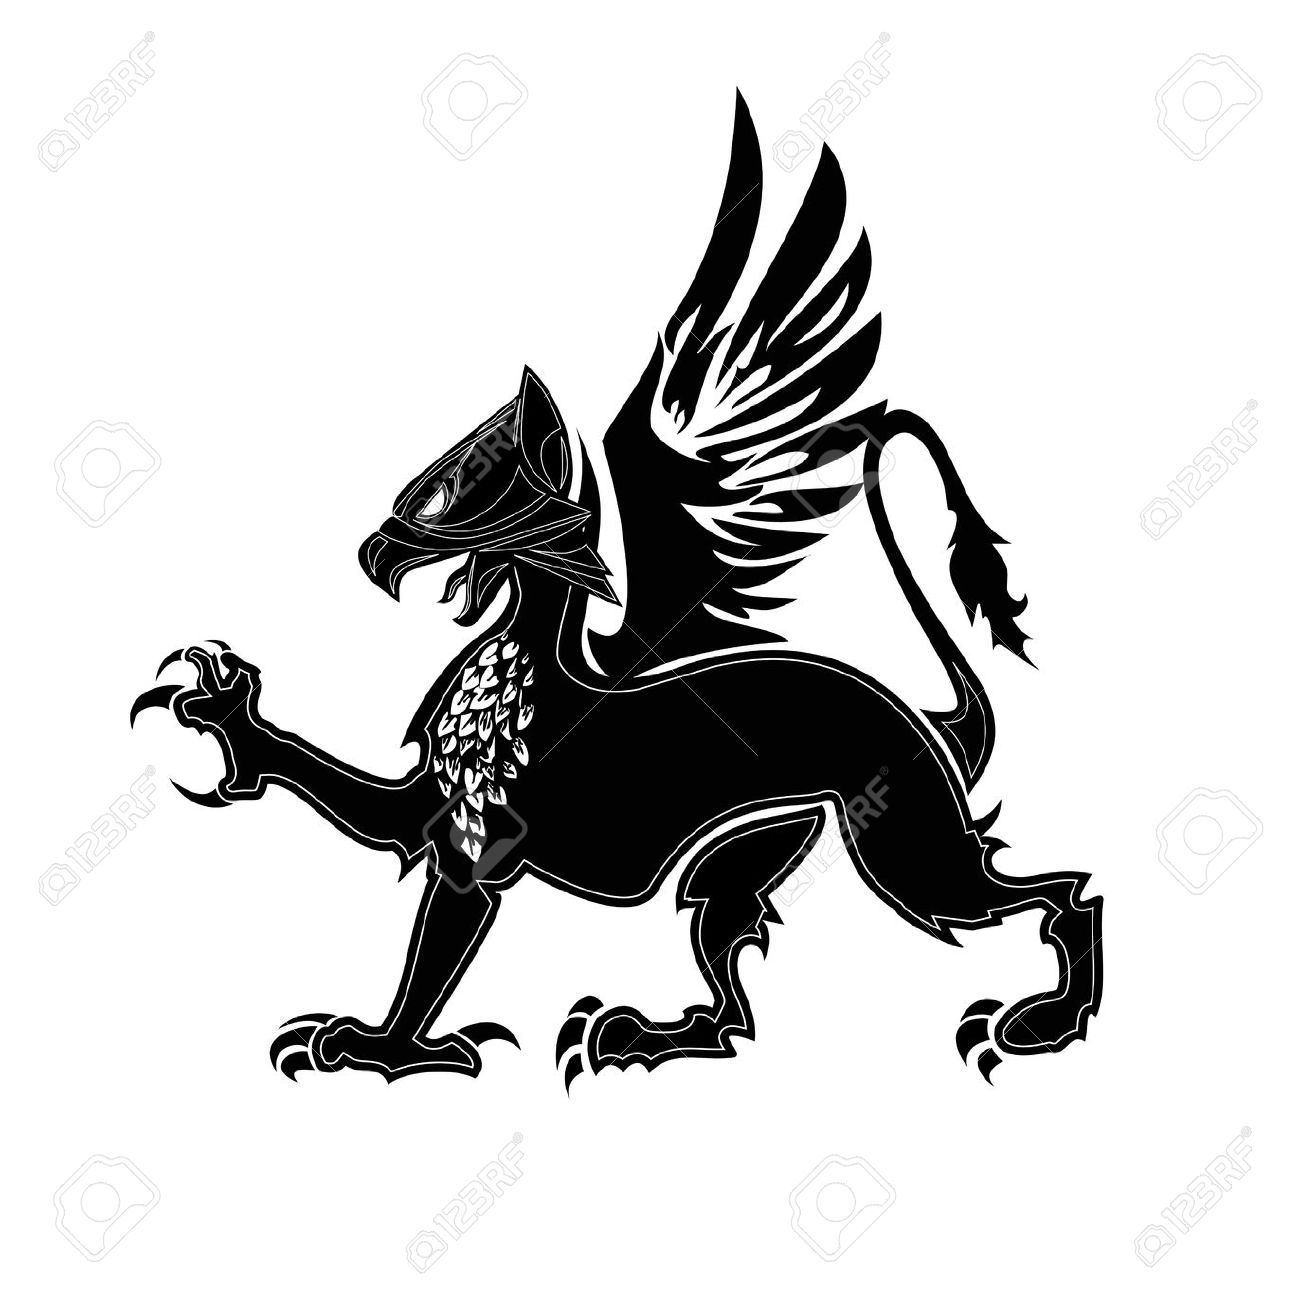 griffin heraldry symbol royalty free cliparts vectors